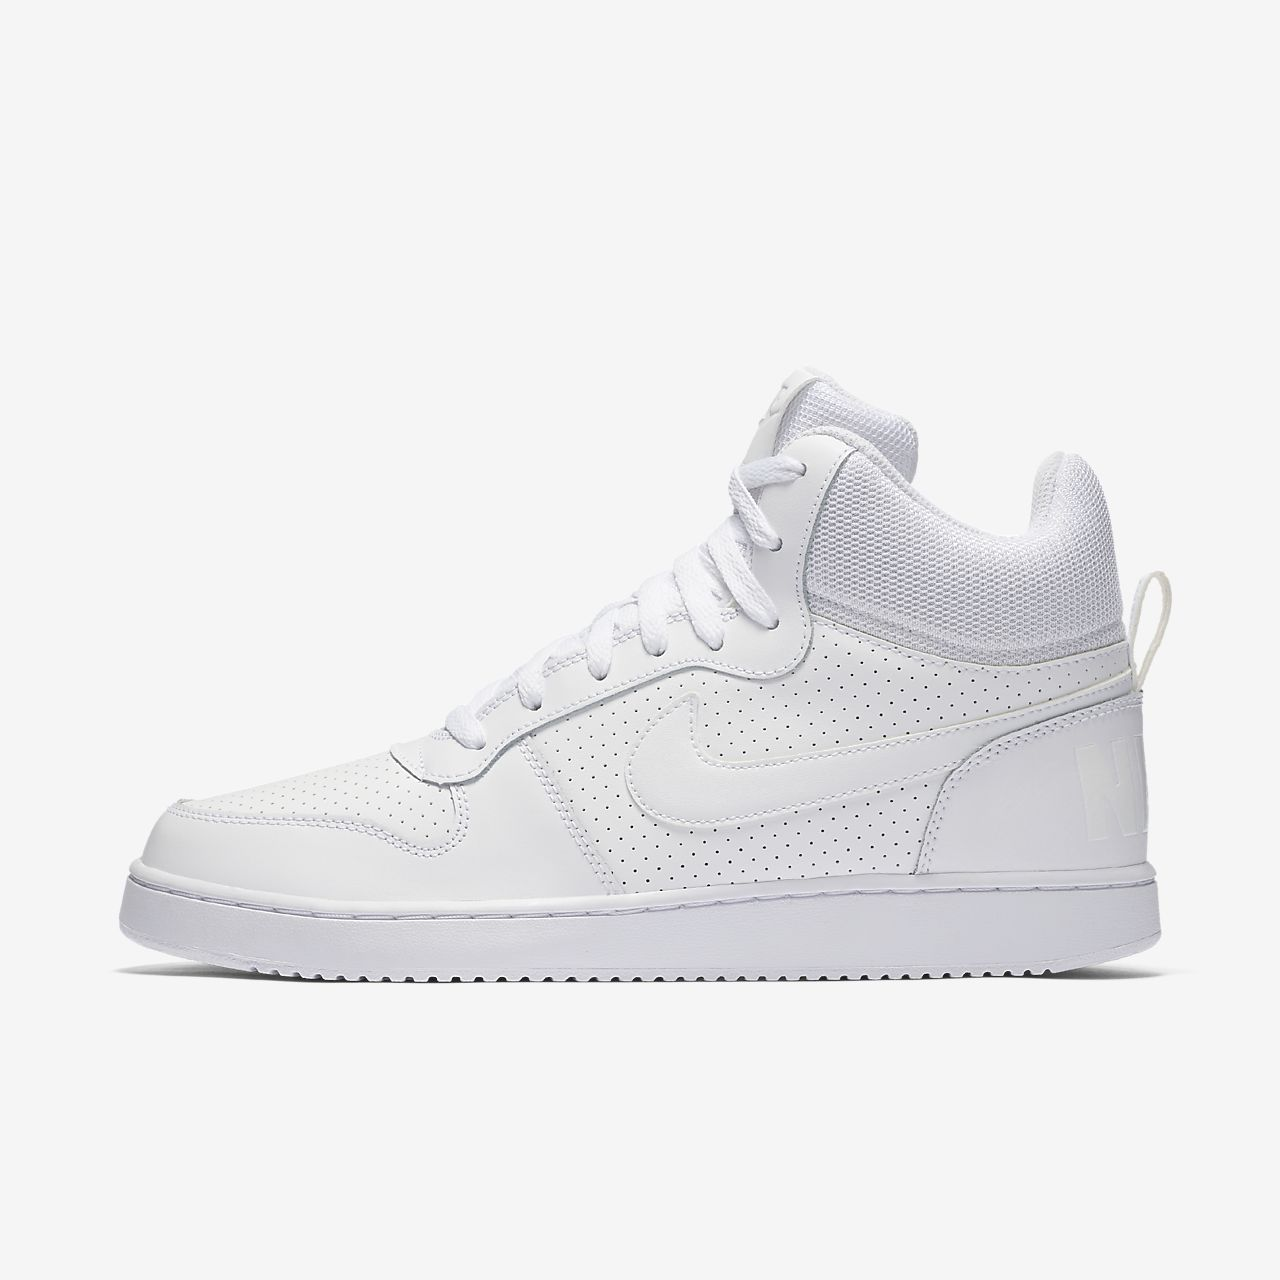 62adc730c74 Low Resolution Ανδρικό παπούτσι NikeCourt Borough Mid Ανδρικό παπούτσι NikeCourt  Borough Mid